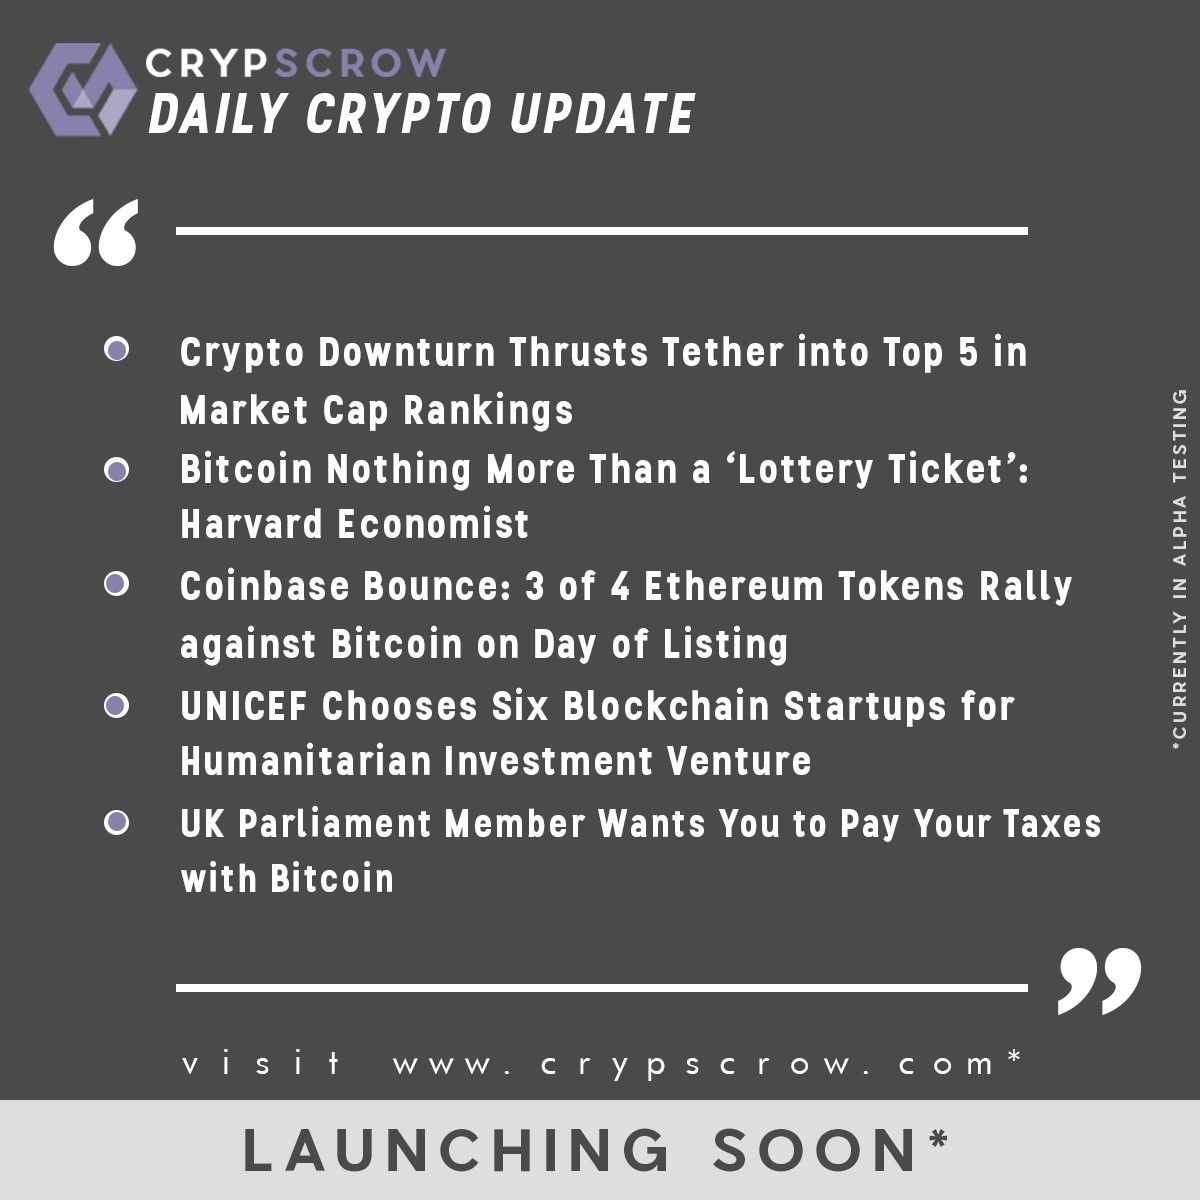 dailycryptoupdate cryptonews crypscrow crypto